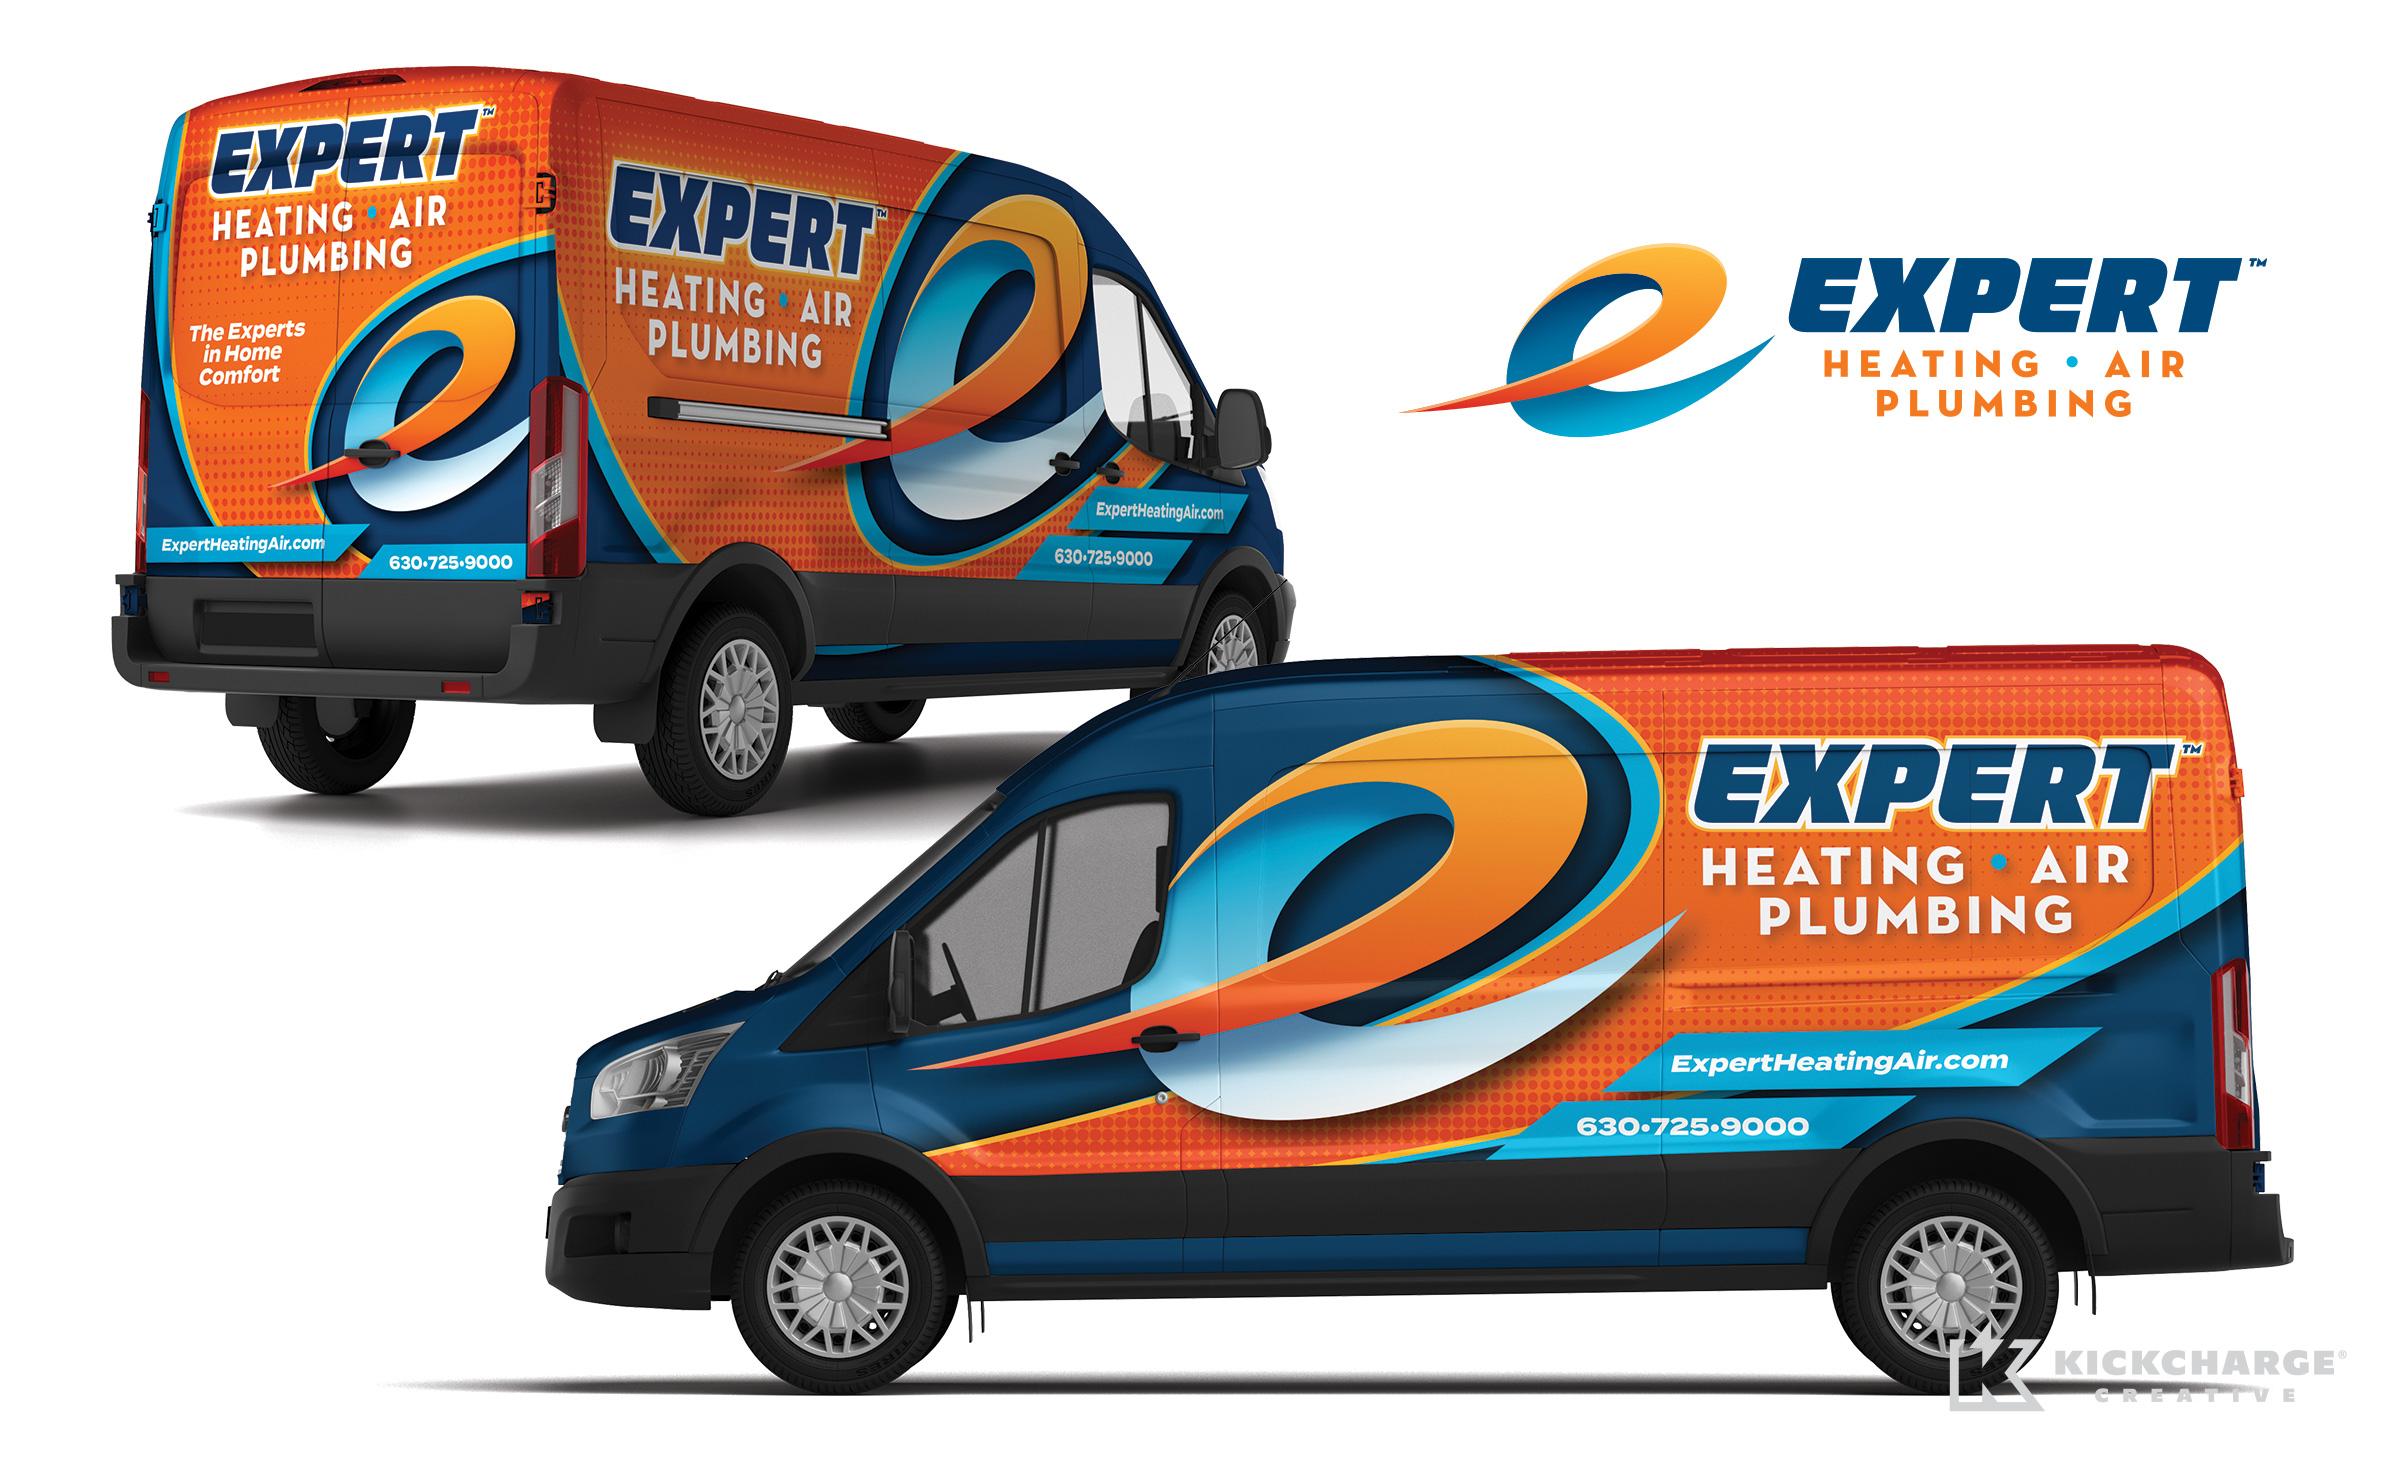 Expert Heating, Air & Plumbing